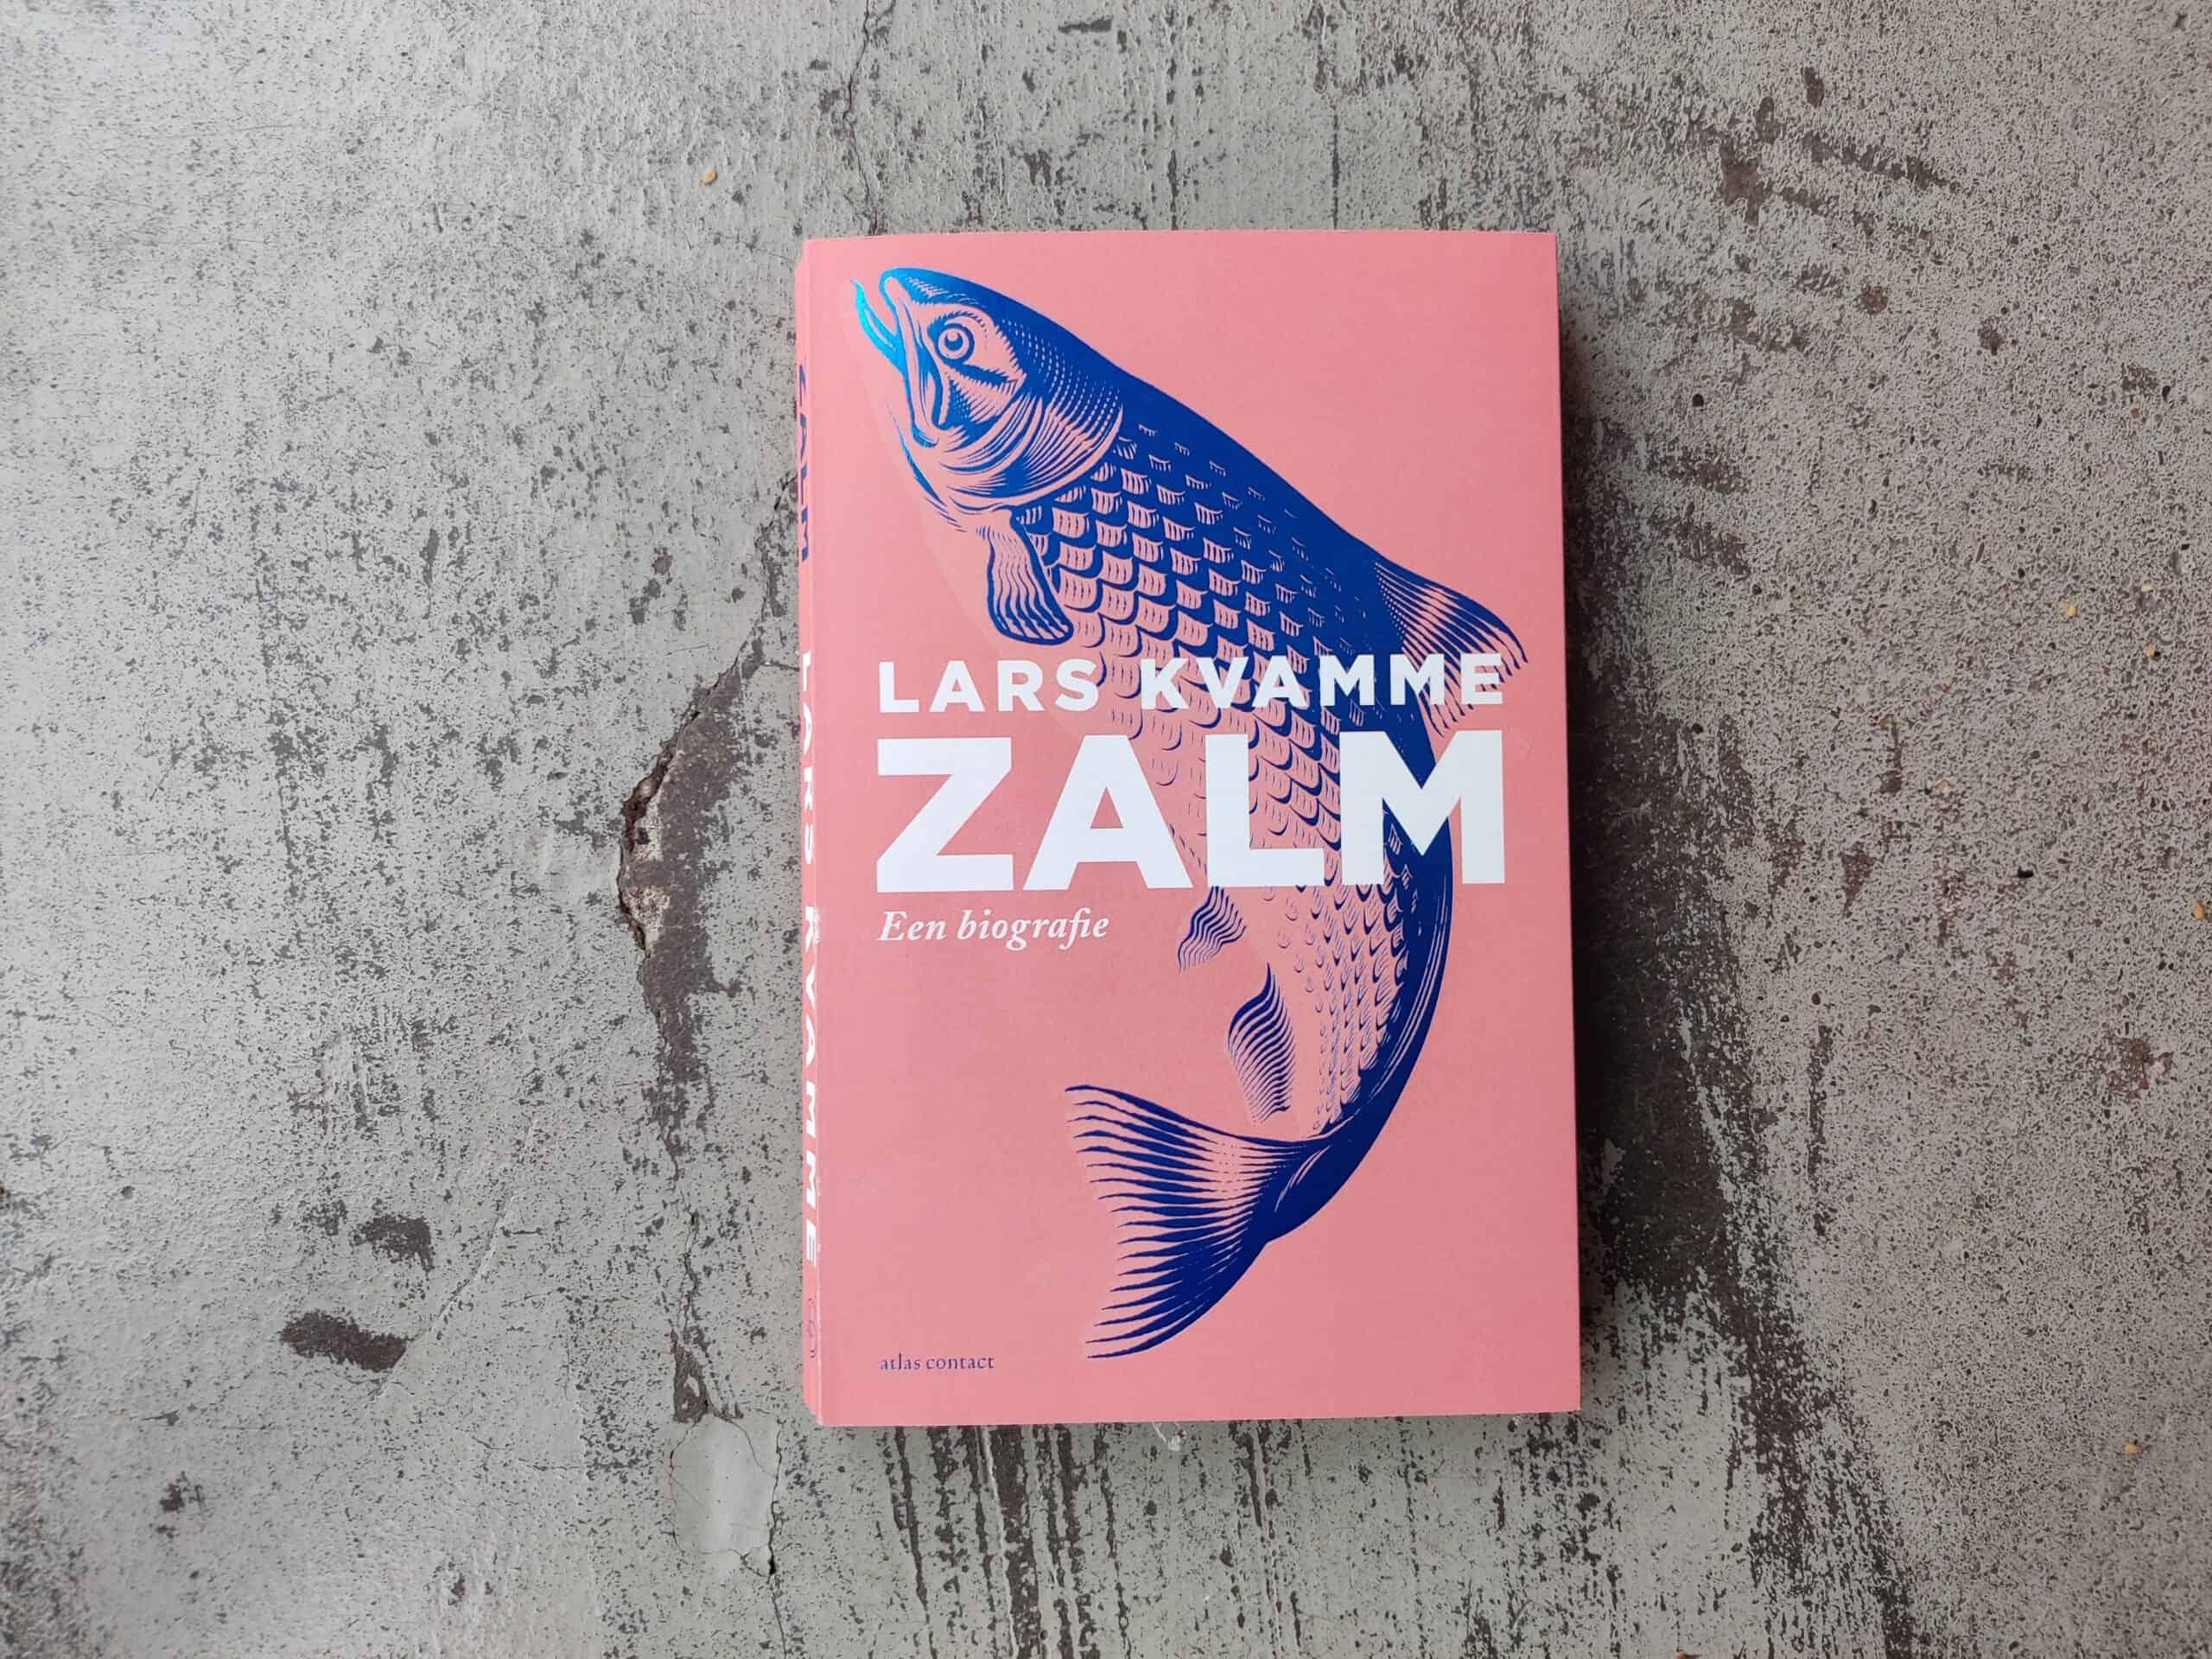 Lars Kvamme - Zalm